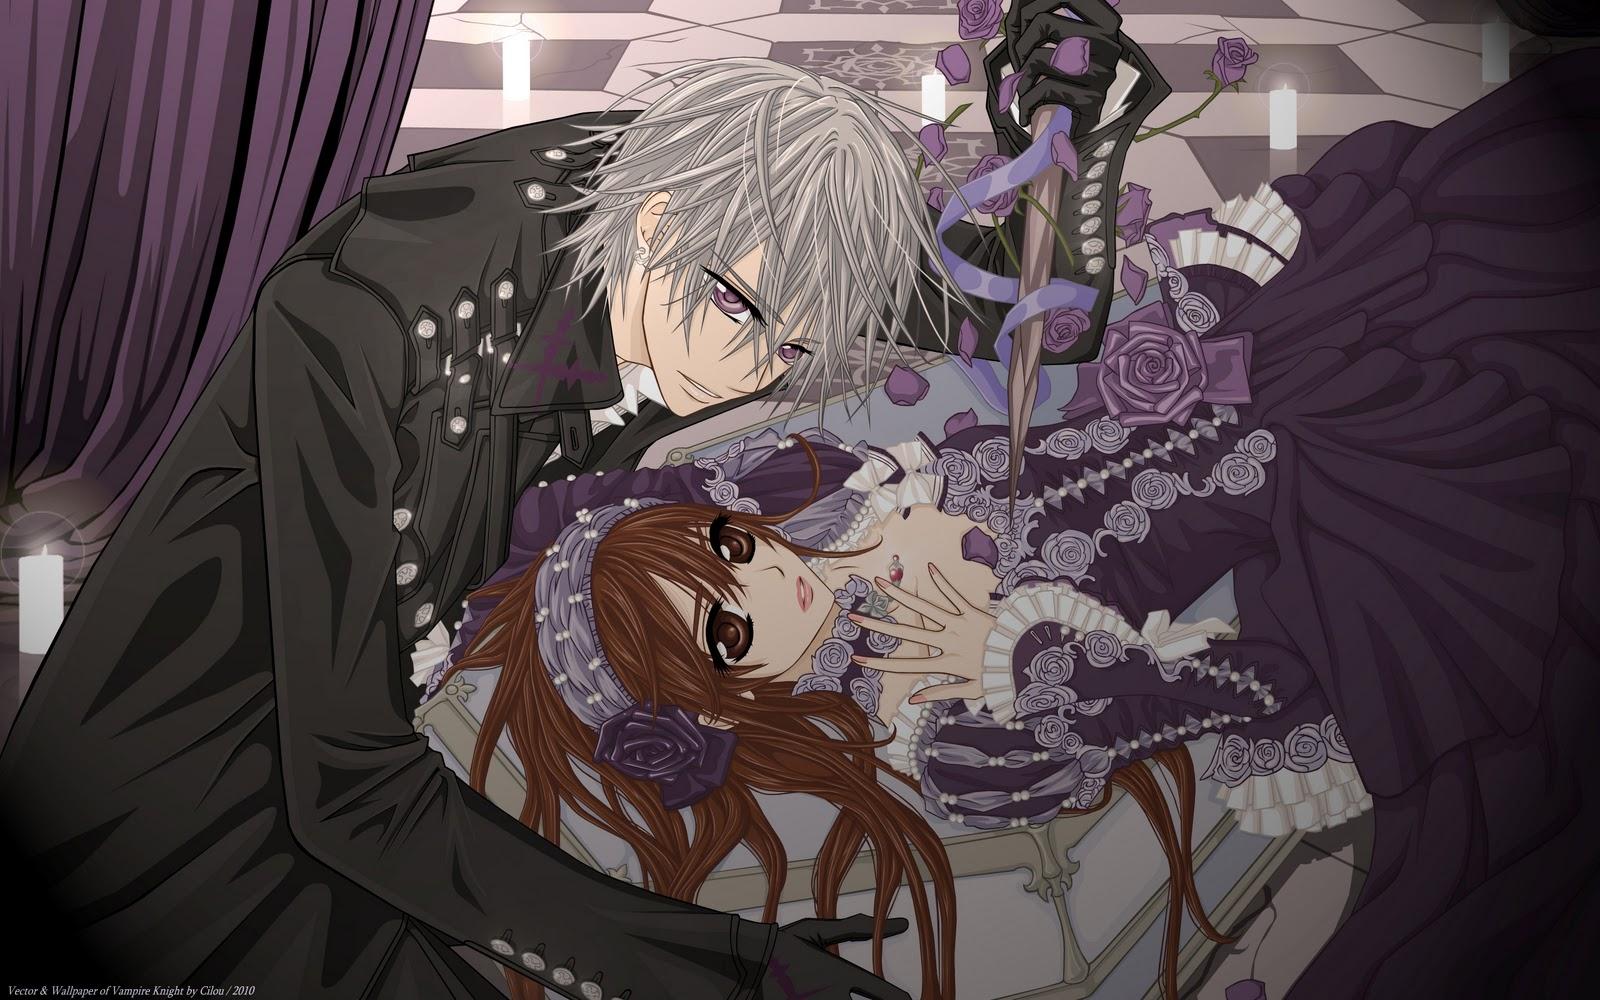 http://2.bp.blogspot.com/-wsz9LbHNJWw/UGYuG6ATr_I/AAAAAAAAAHI/yVij0vjEgPs/s1600/4991+-+kiryu_zero+vampire_knight+wallpaper+yuuki_cross+-+C%C3%B3pia.jpg